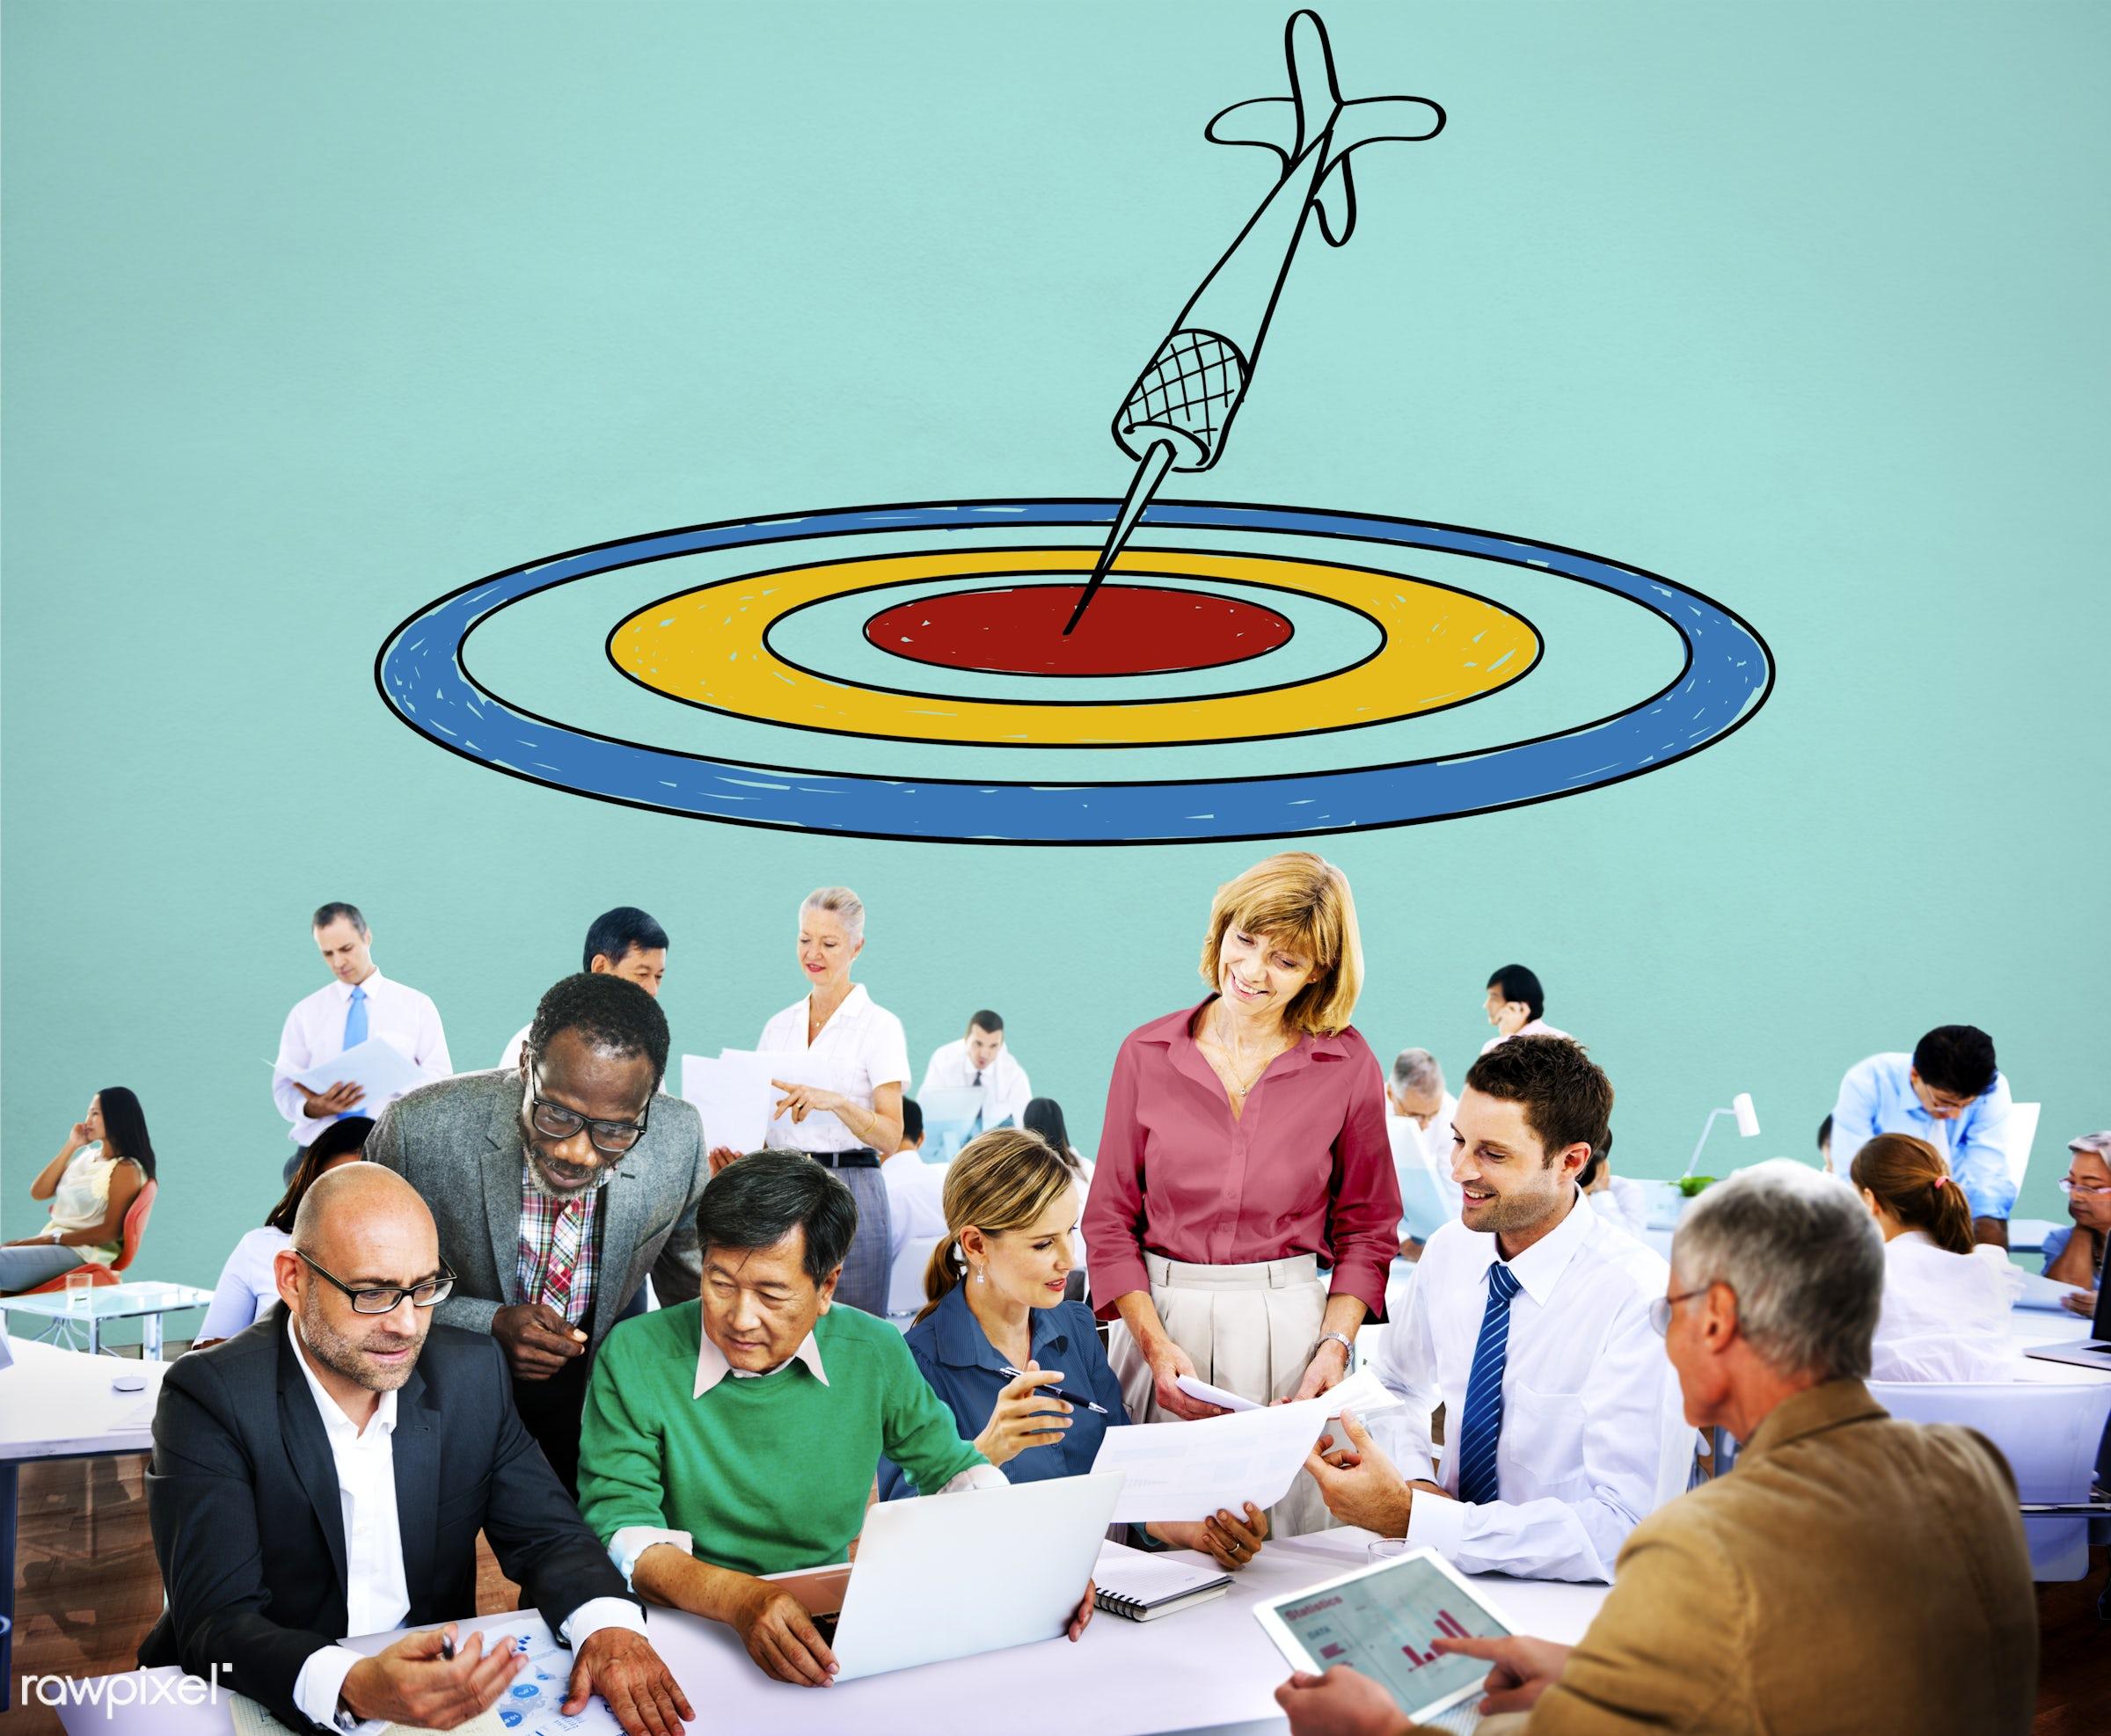 achievement, analysis, aspirations, bull's eye, business, business people, businessmen, businesswomen, busy, communication,...